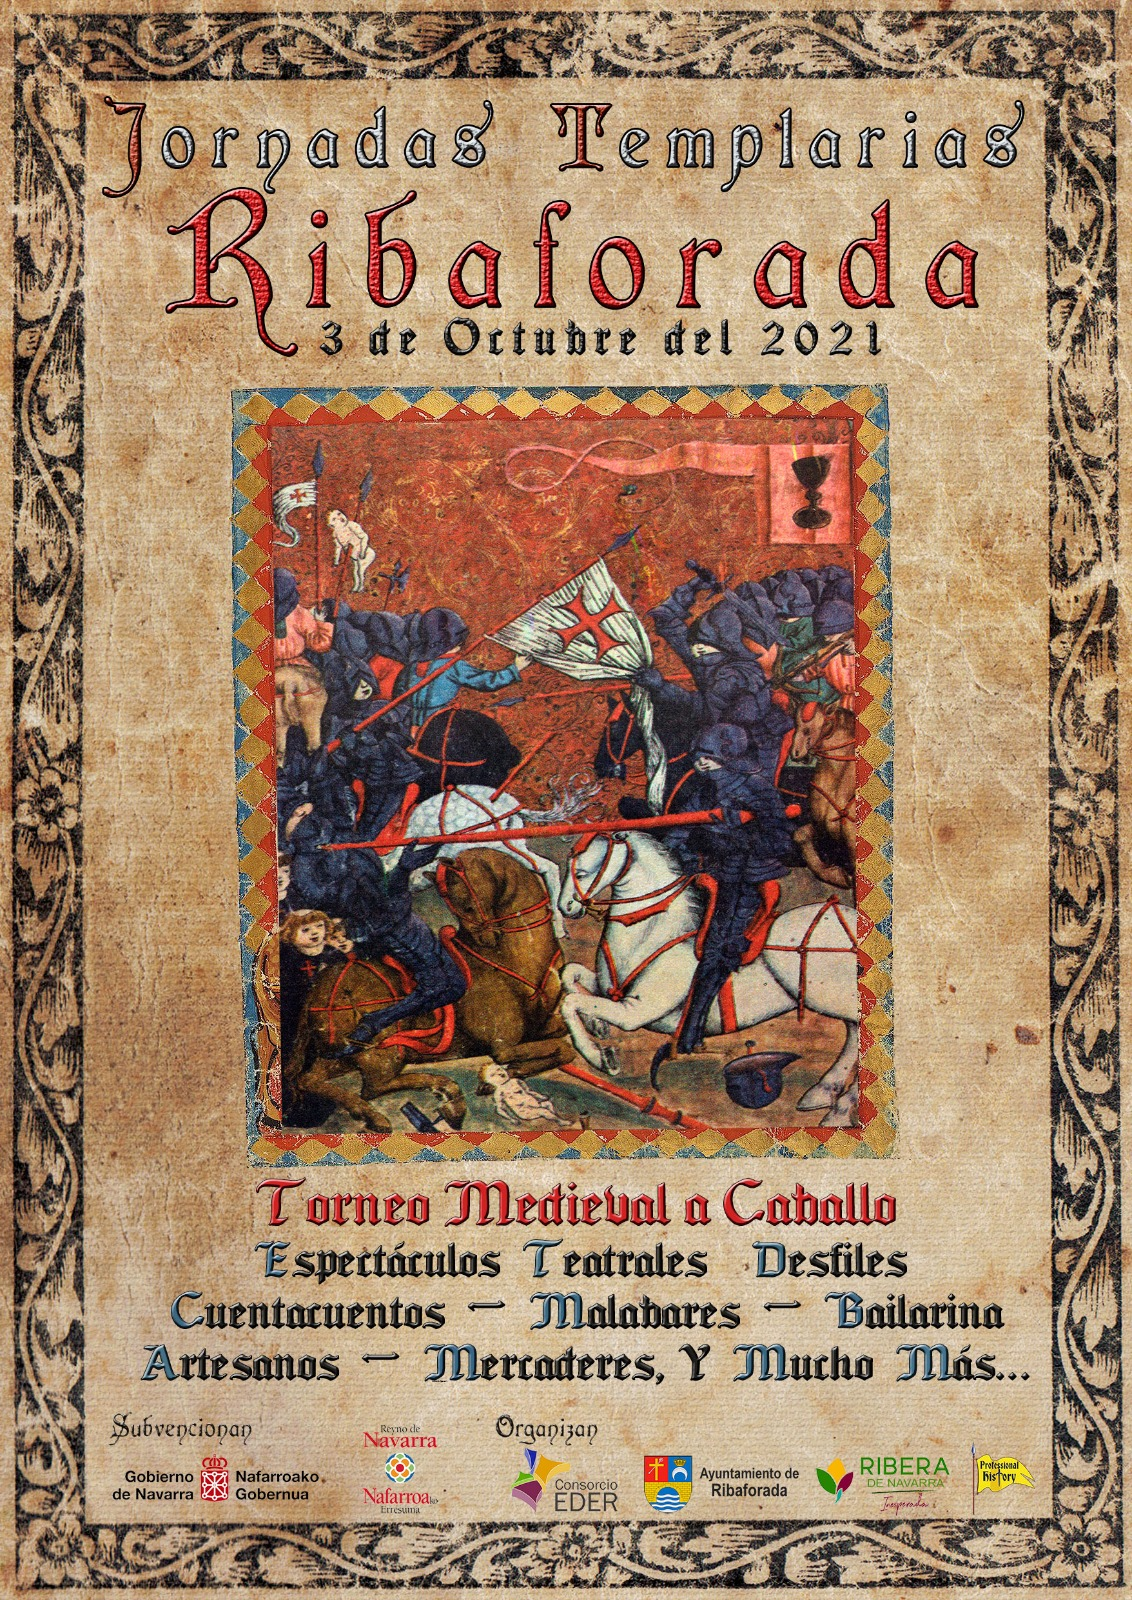 Jornadas Templarias Ribaforada